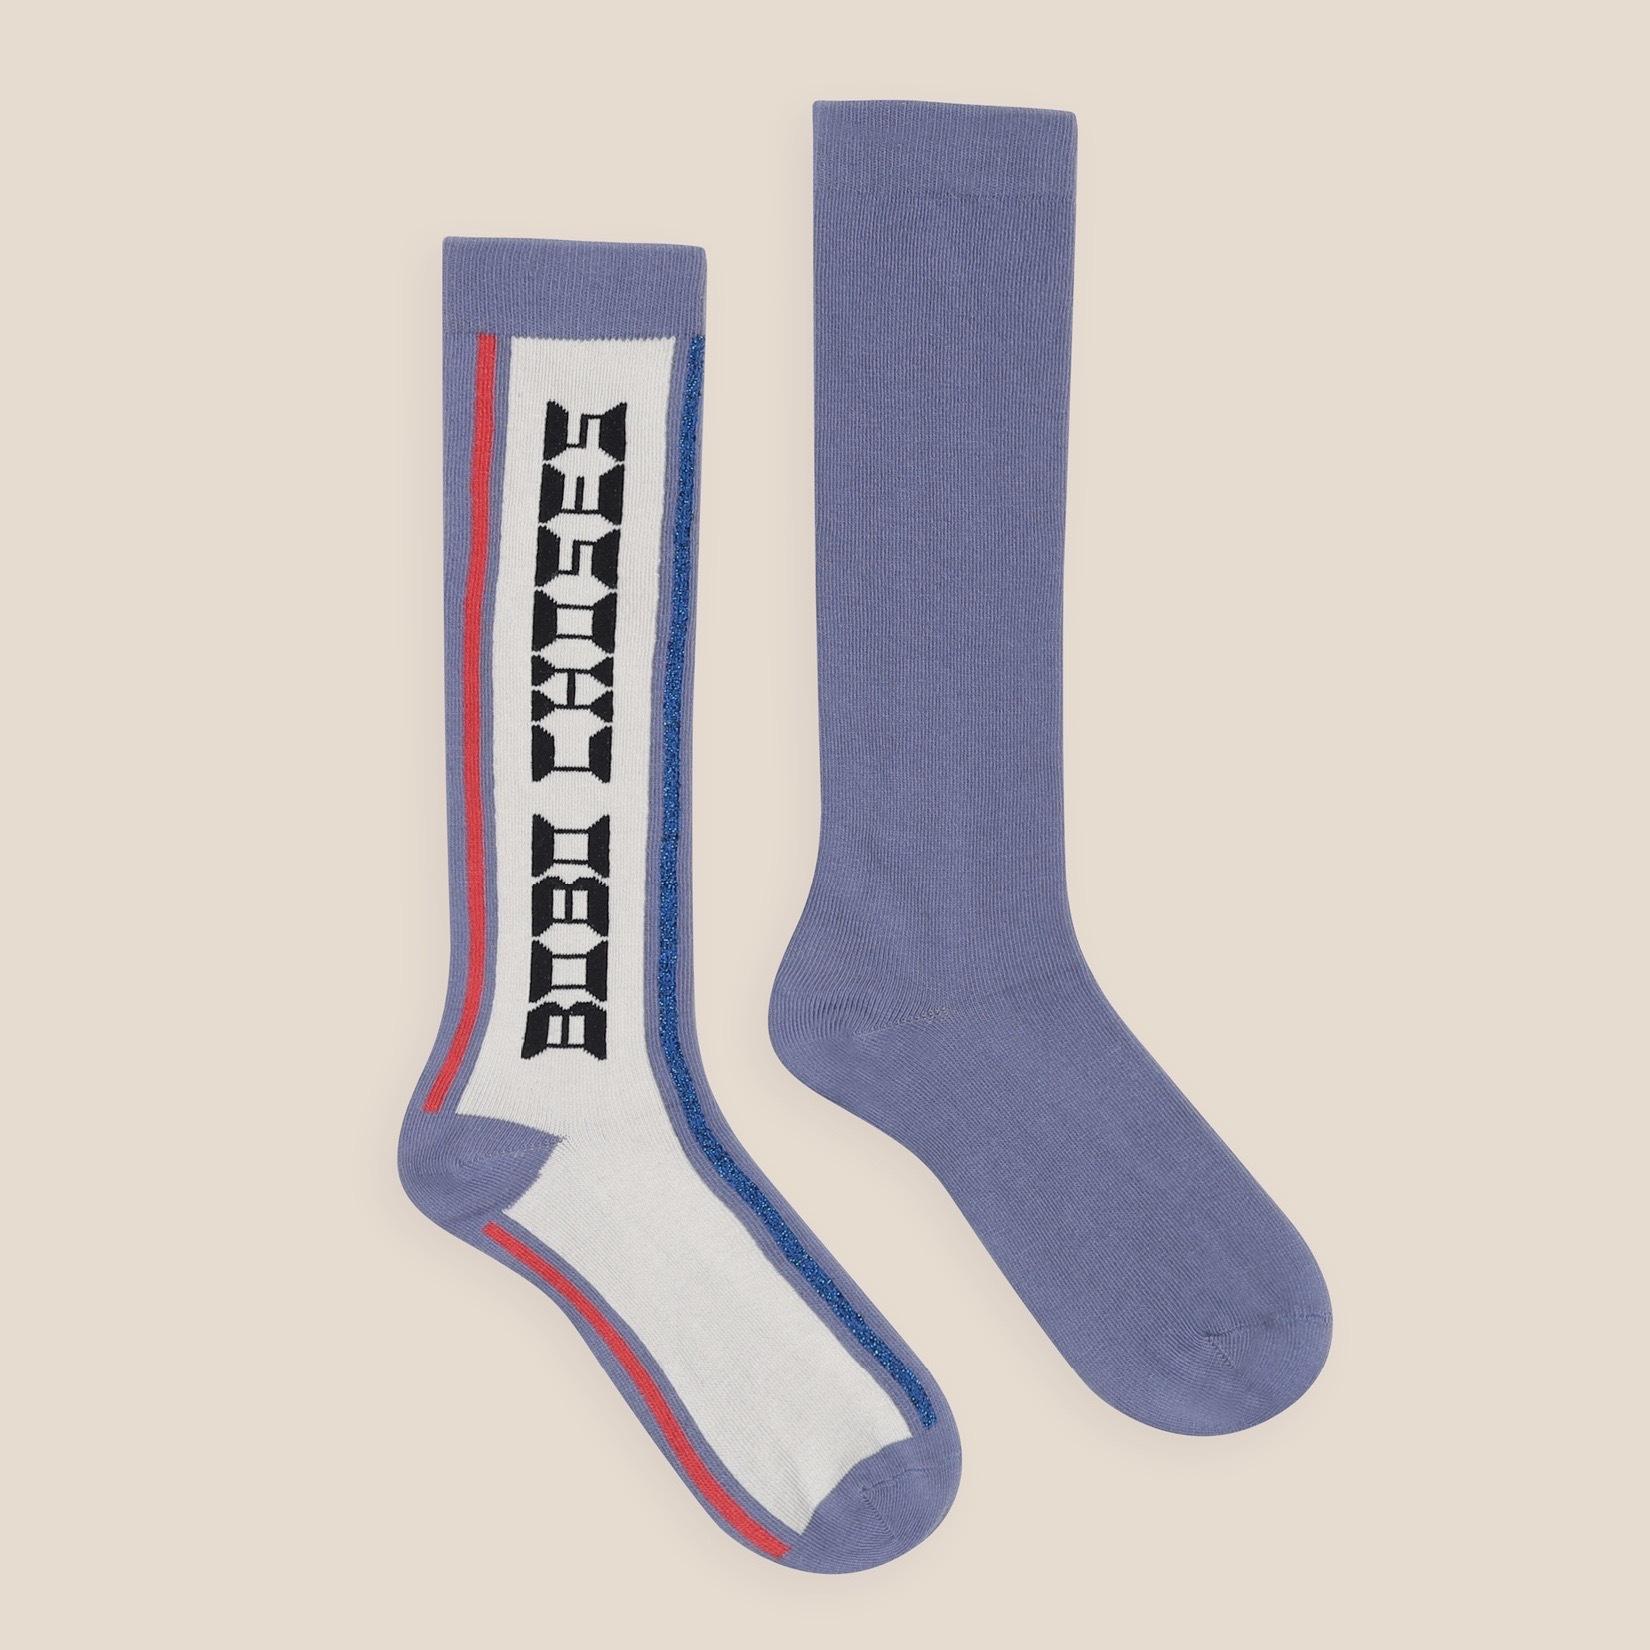 《BOBO CHOSES 2020AW》Bobo Choses long socks